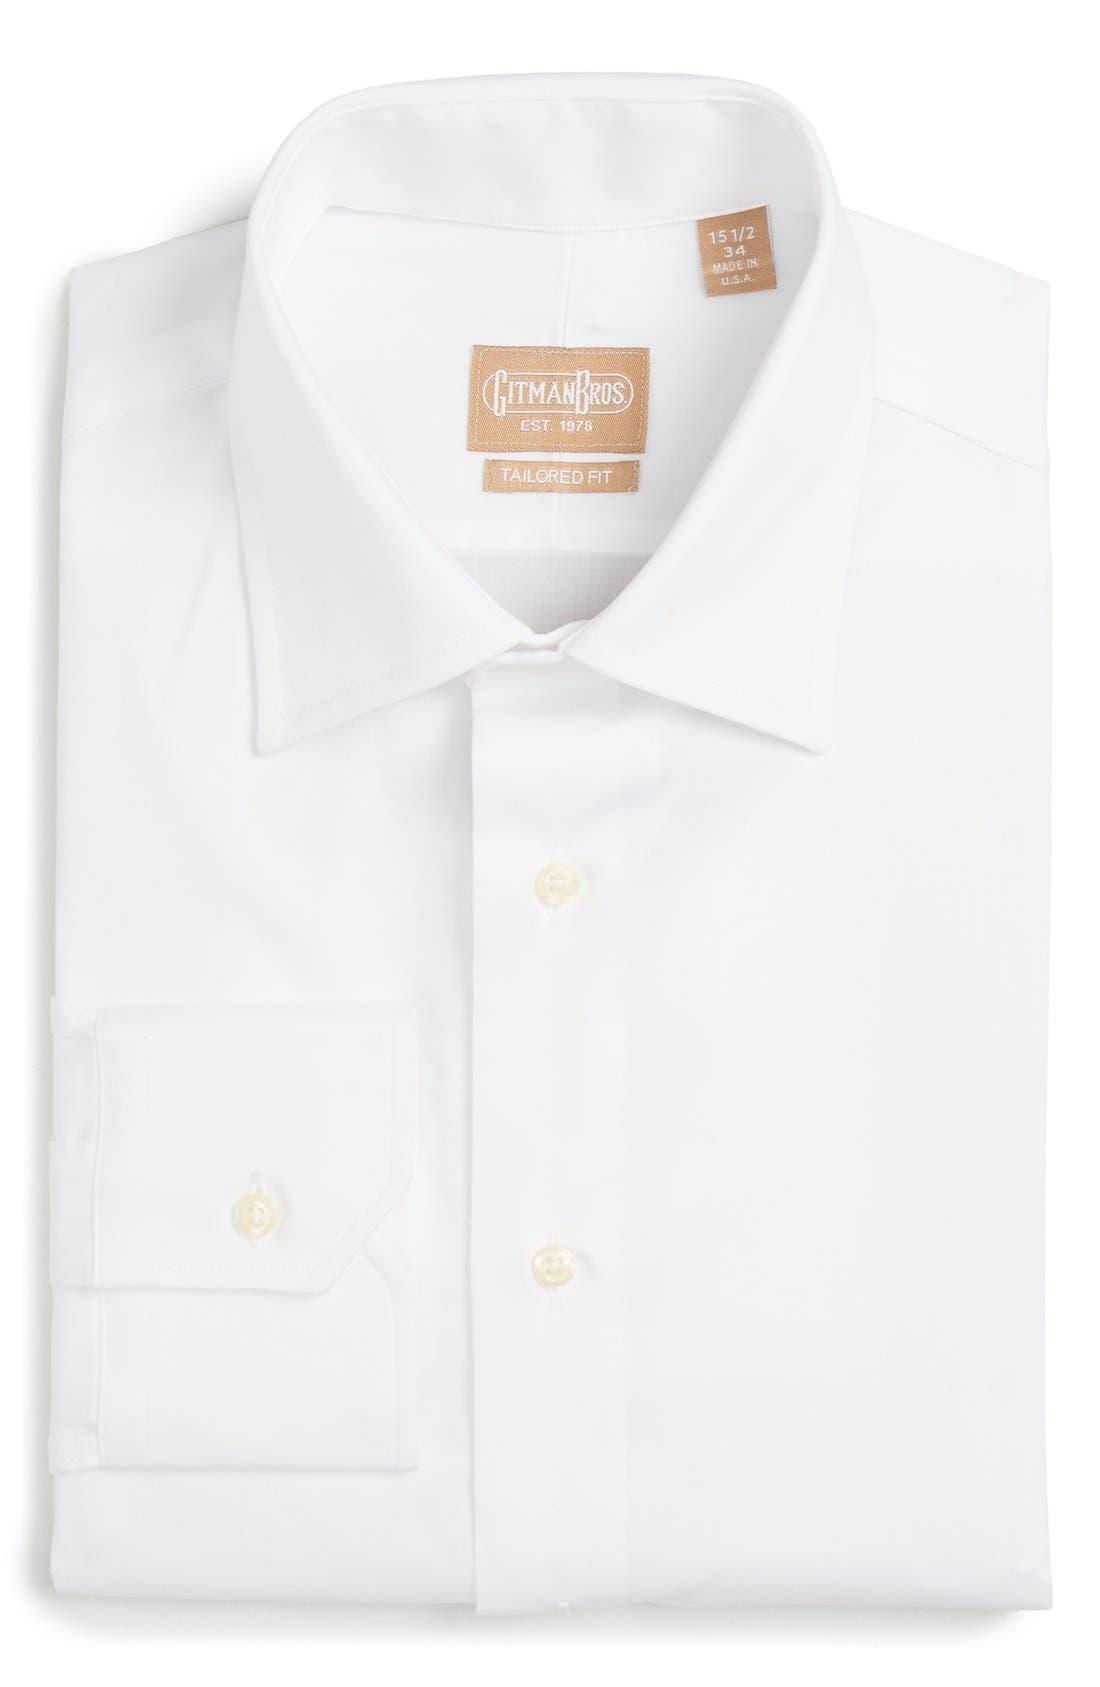 GITMAN, Tailored Fit Solid Dress Shirt, Main thumbnail 1, color, WHITE